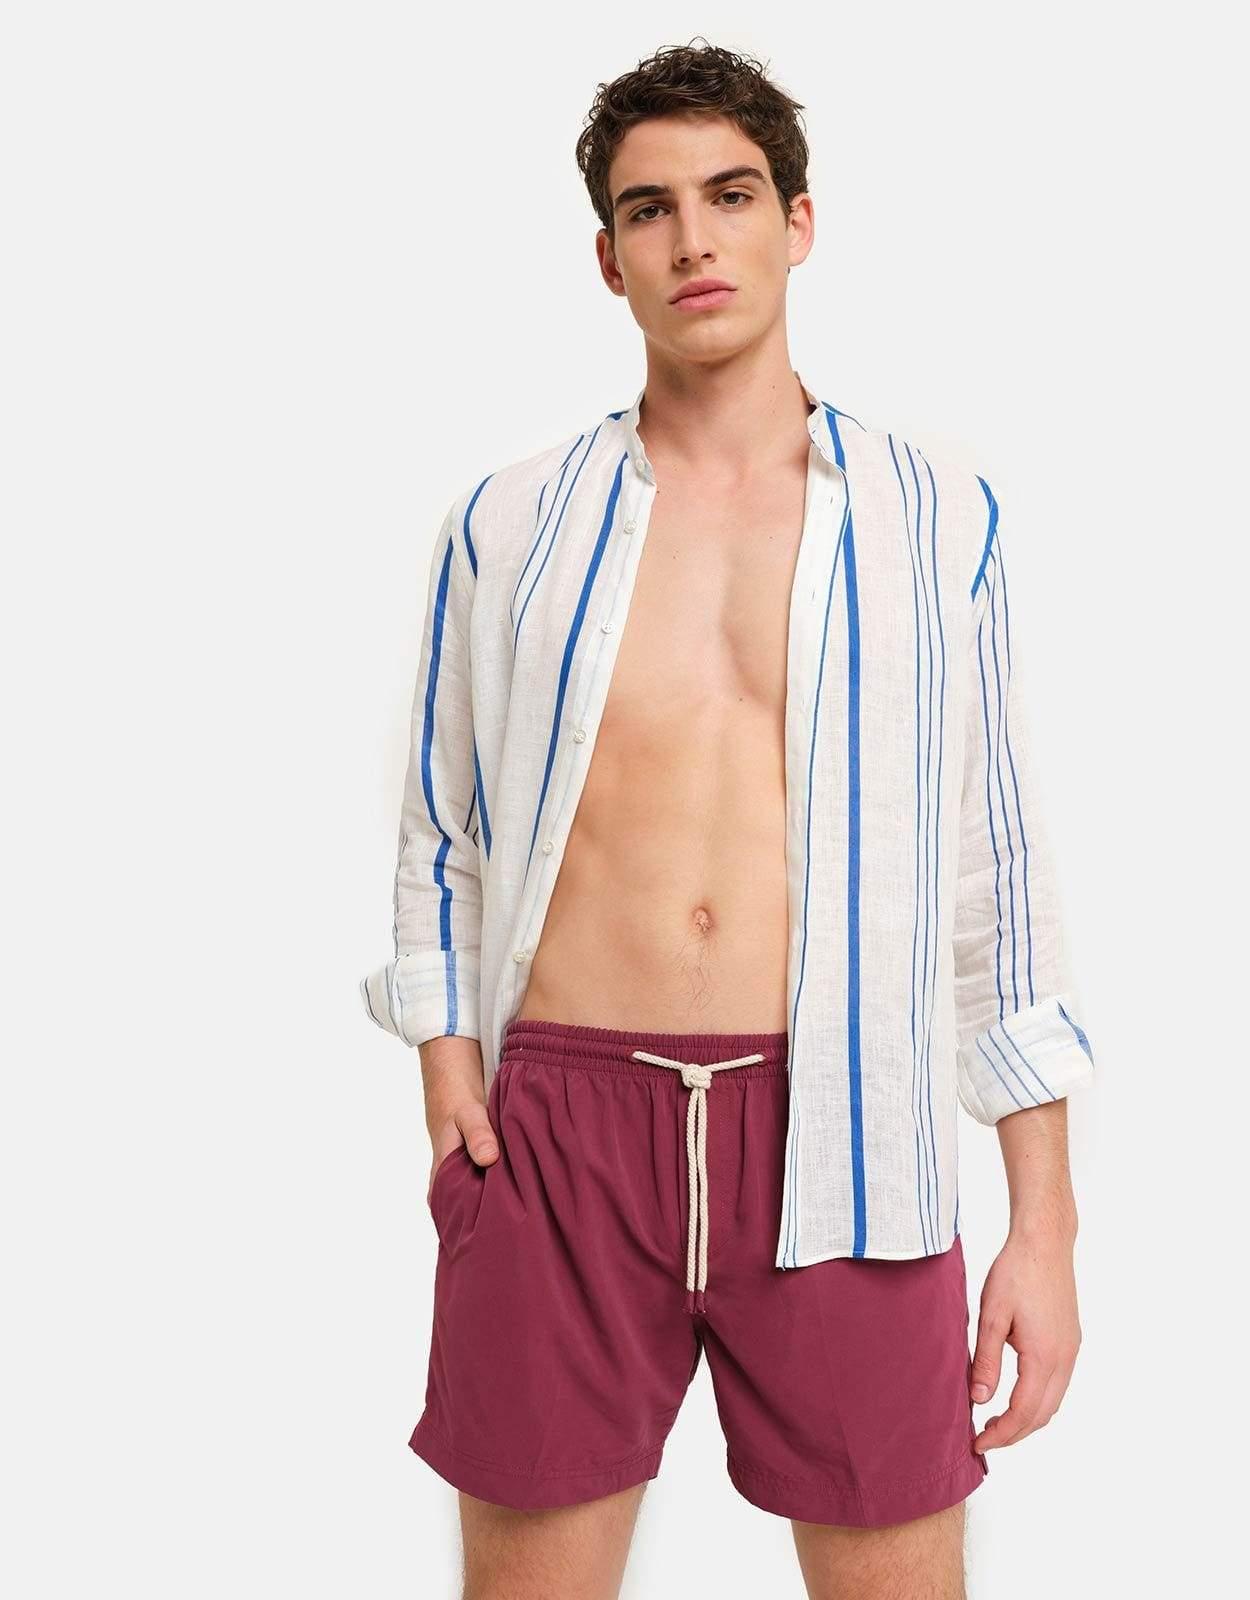 Peninsula Swimwear ISOLA ROSSA MICRO ELASTIC